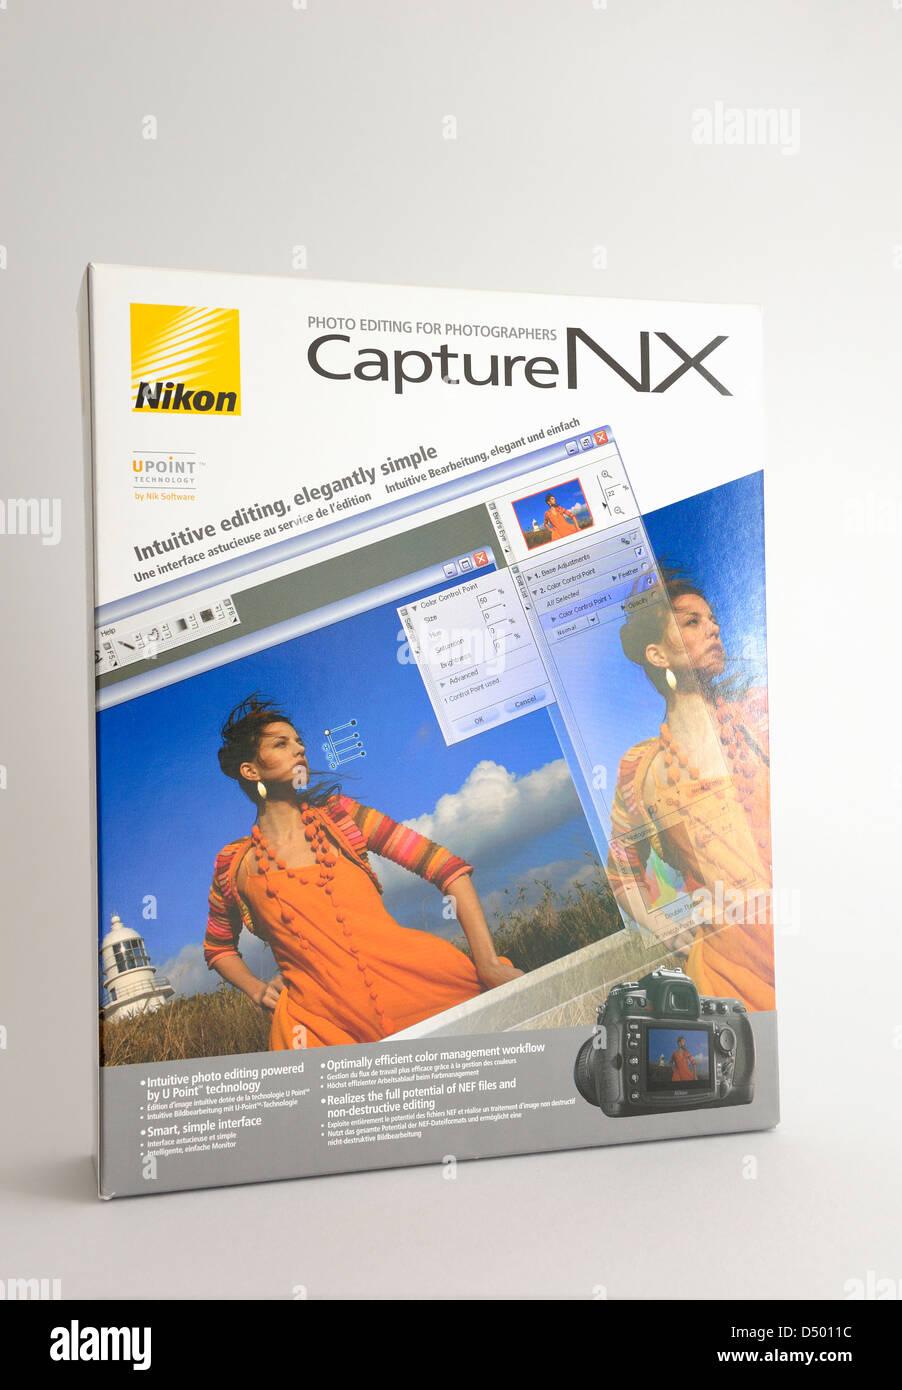 Caja de software Nikon Capture NX Imagen De Stock